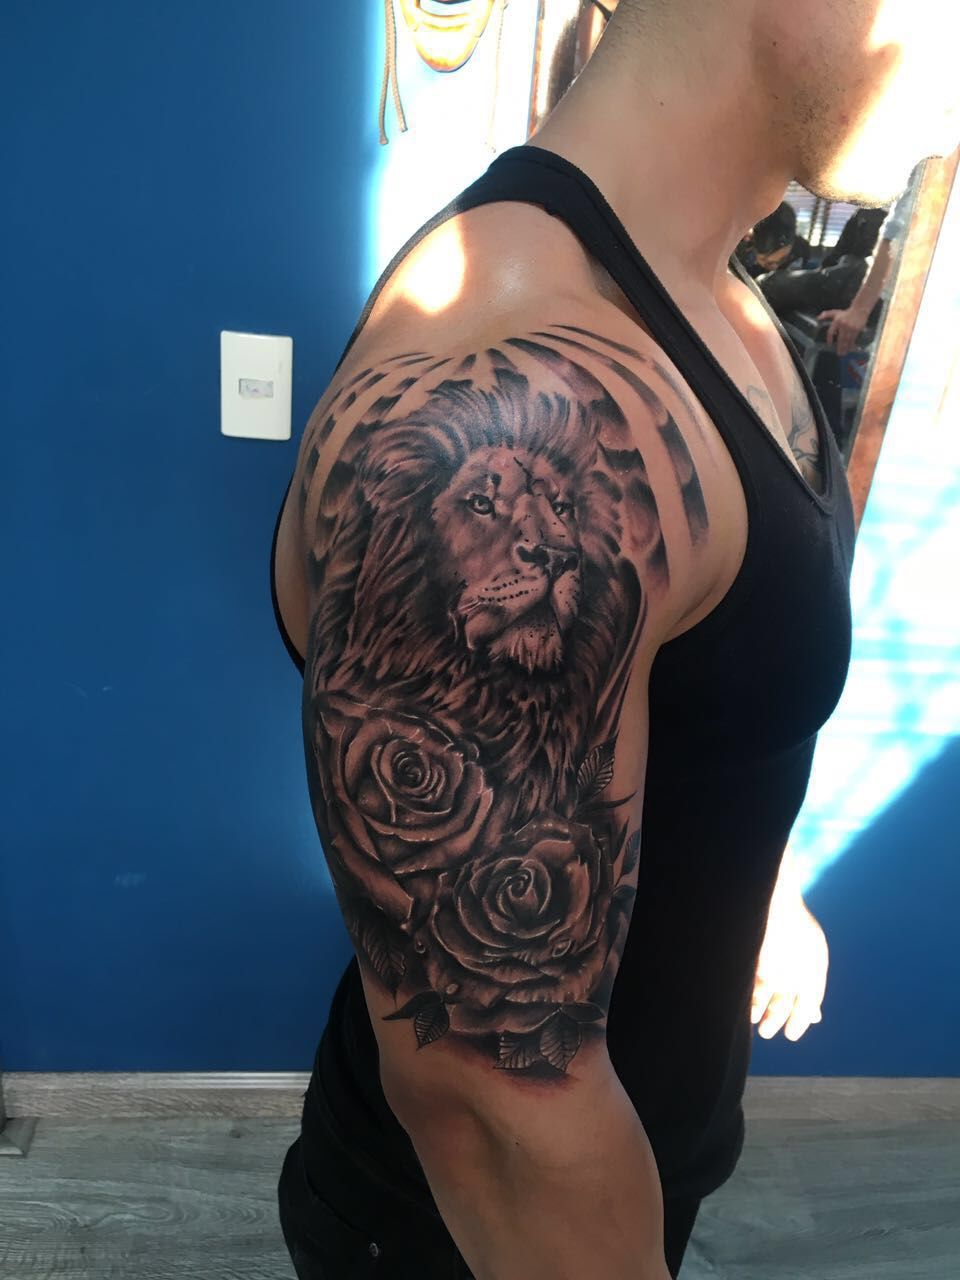 bd08dfb32 Lion, Roses and lighting half sleeve tattoo | Tats | Lion tattoo ...